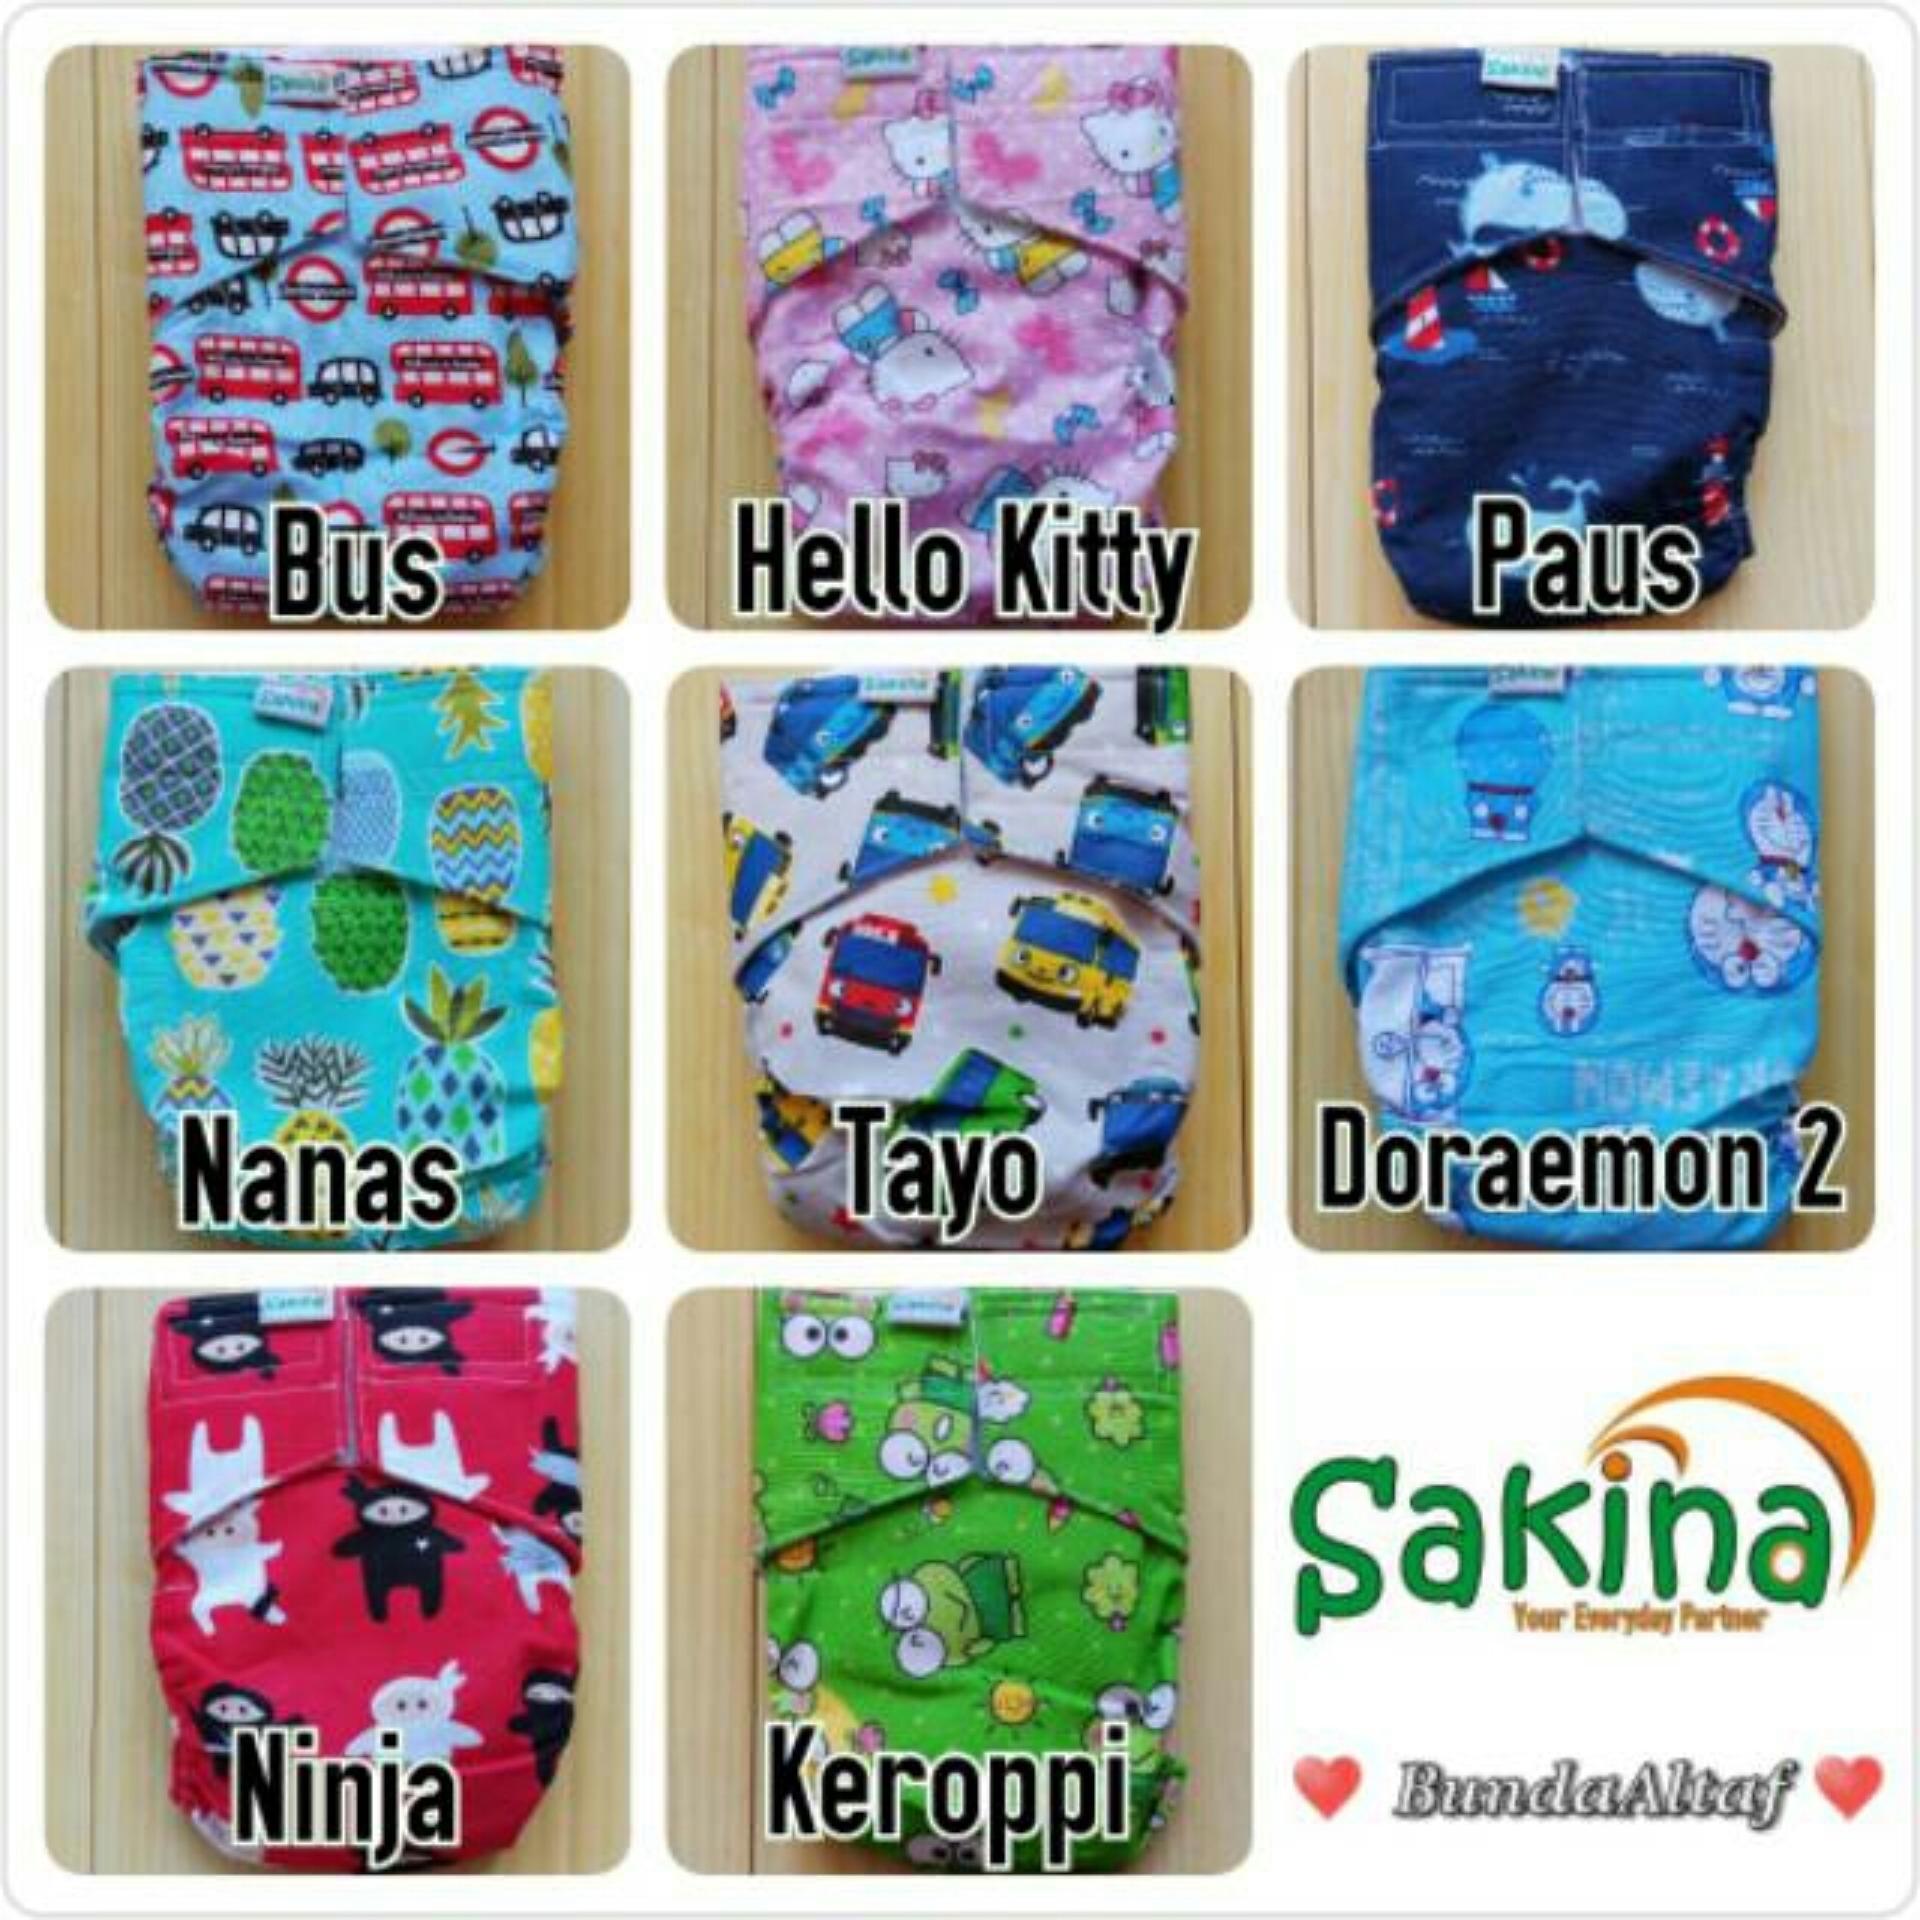 Dapat 5 Pc Clodi Sakina Cover Celana 3-11 Kg - 2 .